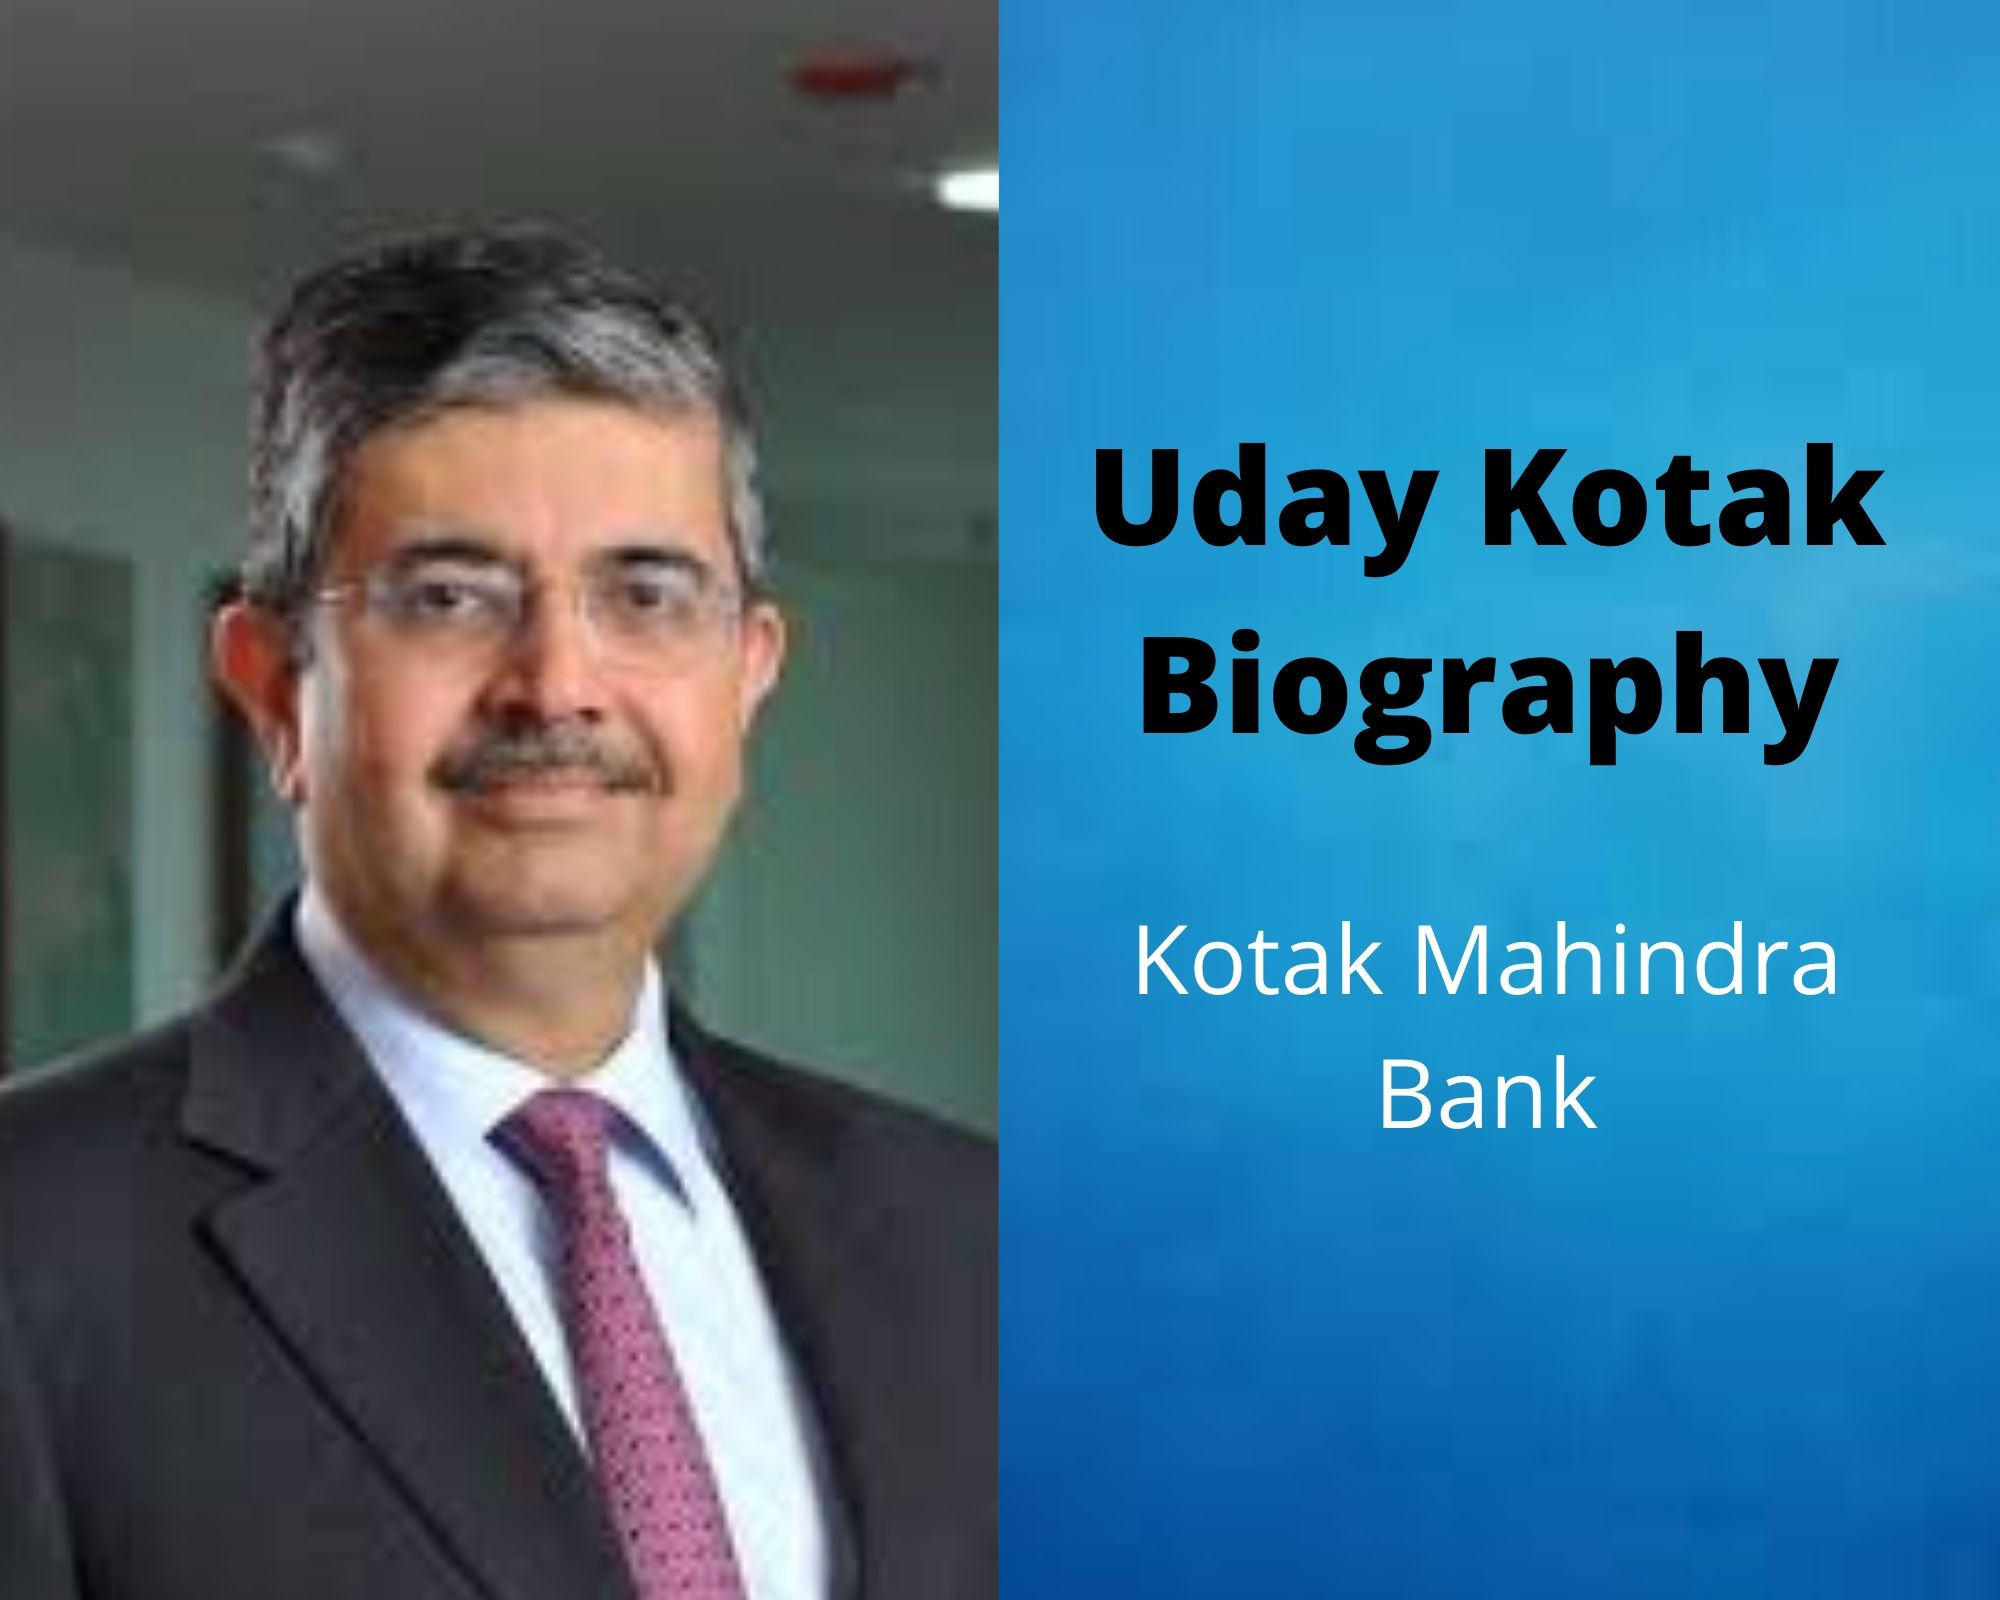 Uday Kotak Biography | Education | Family | Net worth | Kotak Mahindra Bank